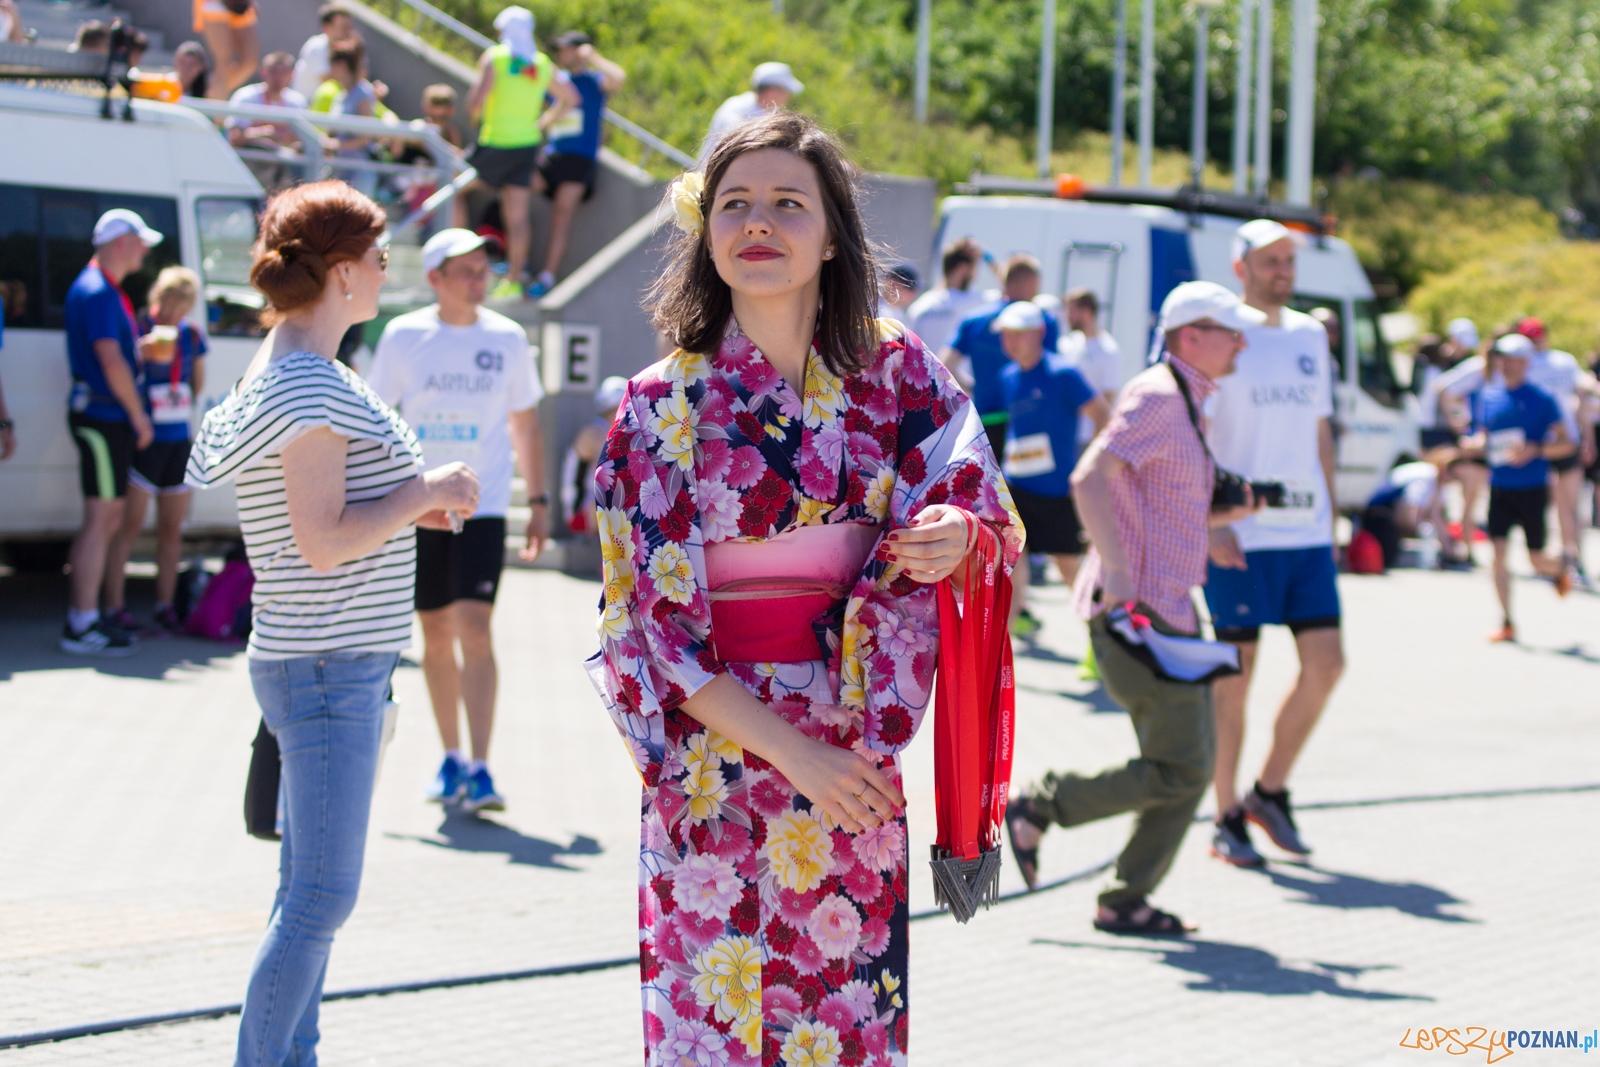 V XLPL Ekiden  Foto: lepszyPOZNAN.pl / Ewelina Jaskowiak